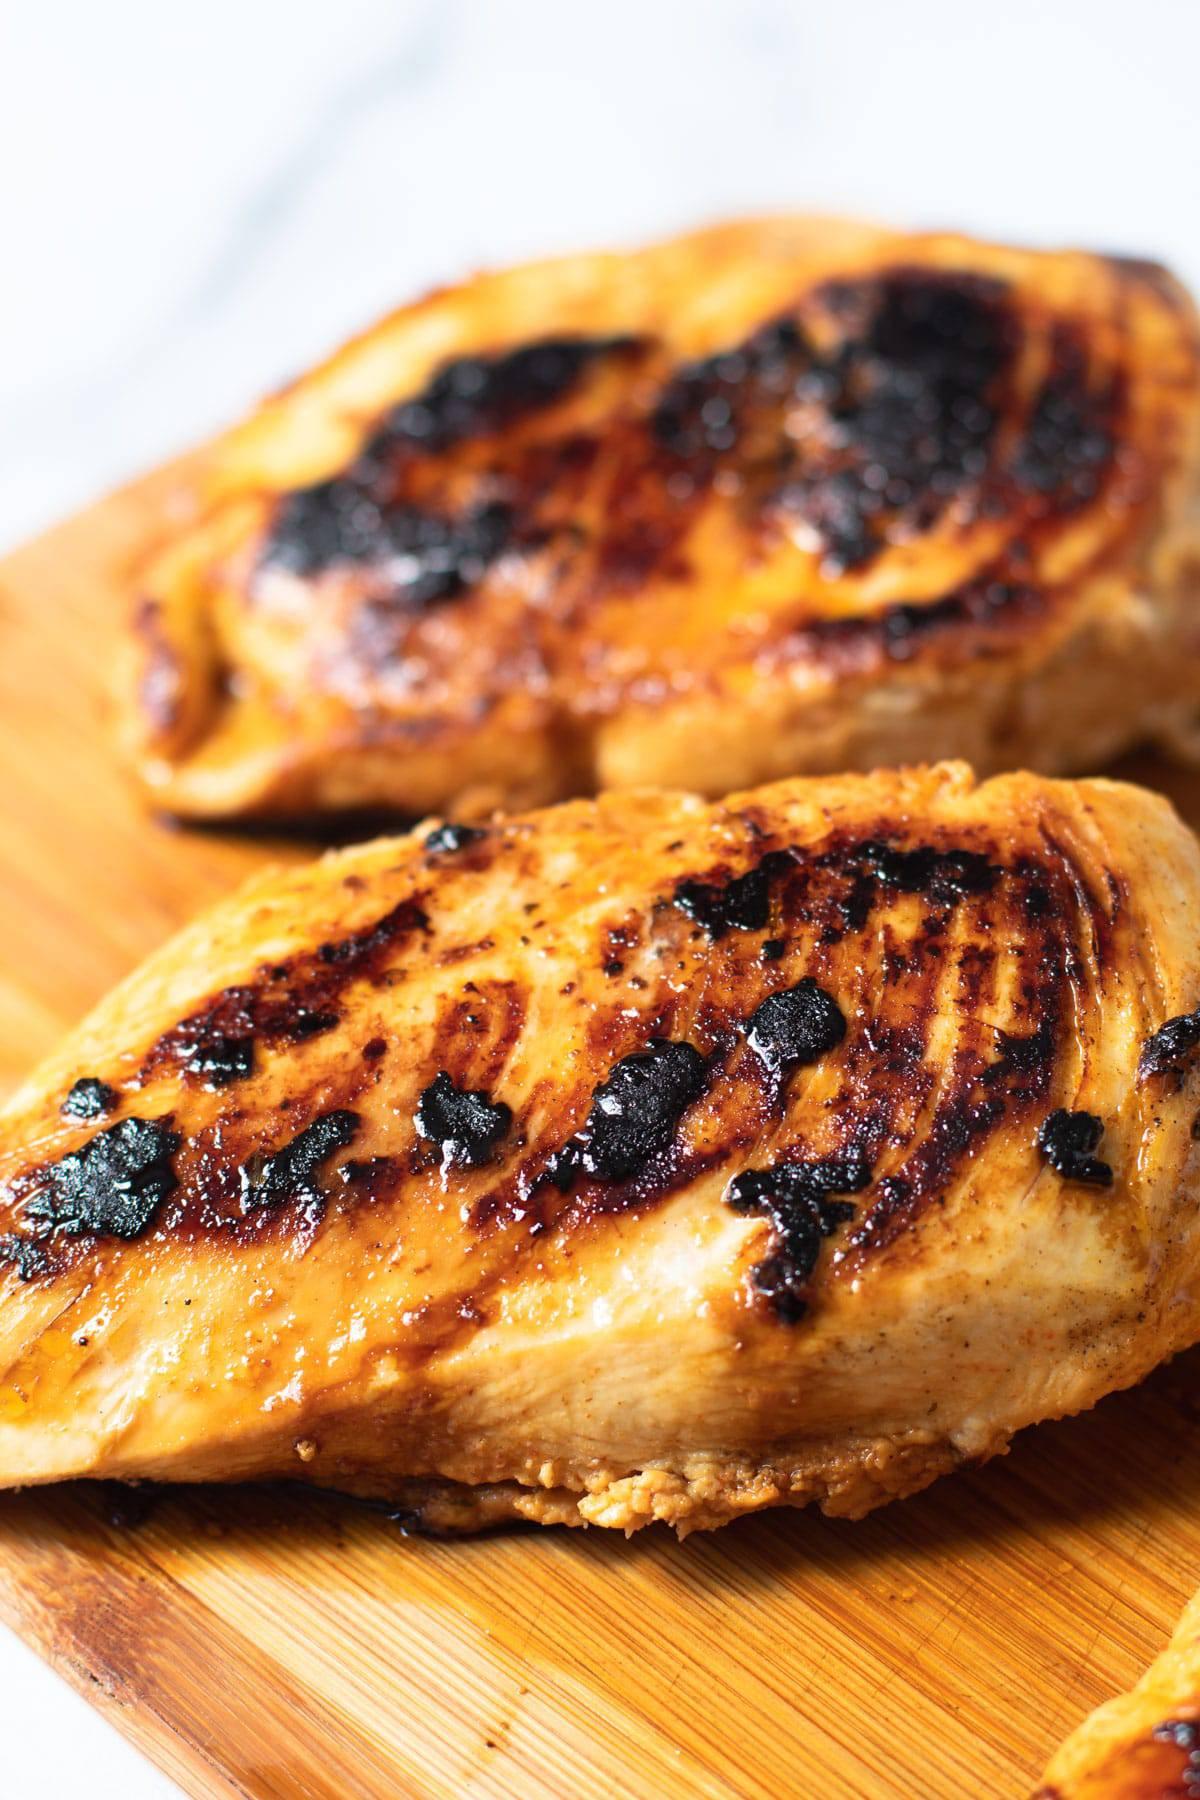 Pan seared chicken breasts for fajita salad.